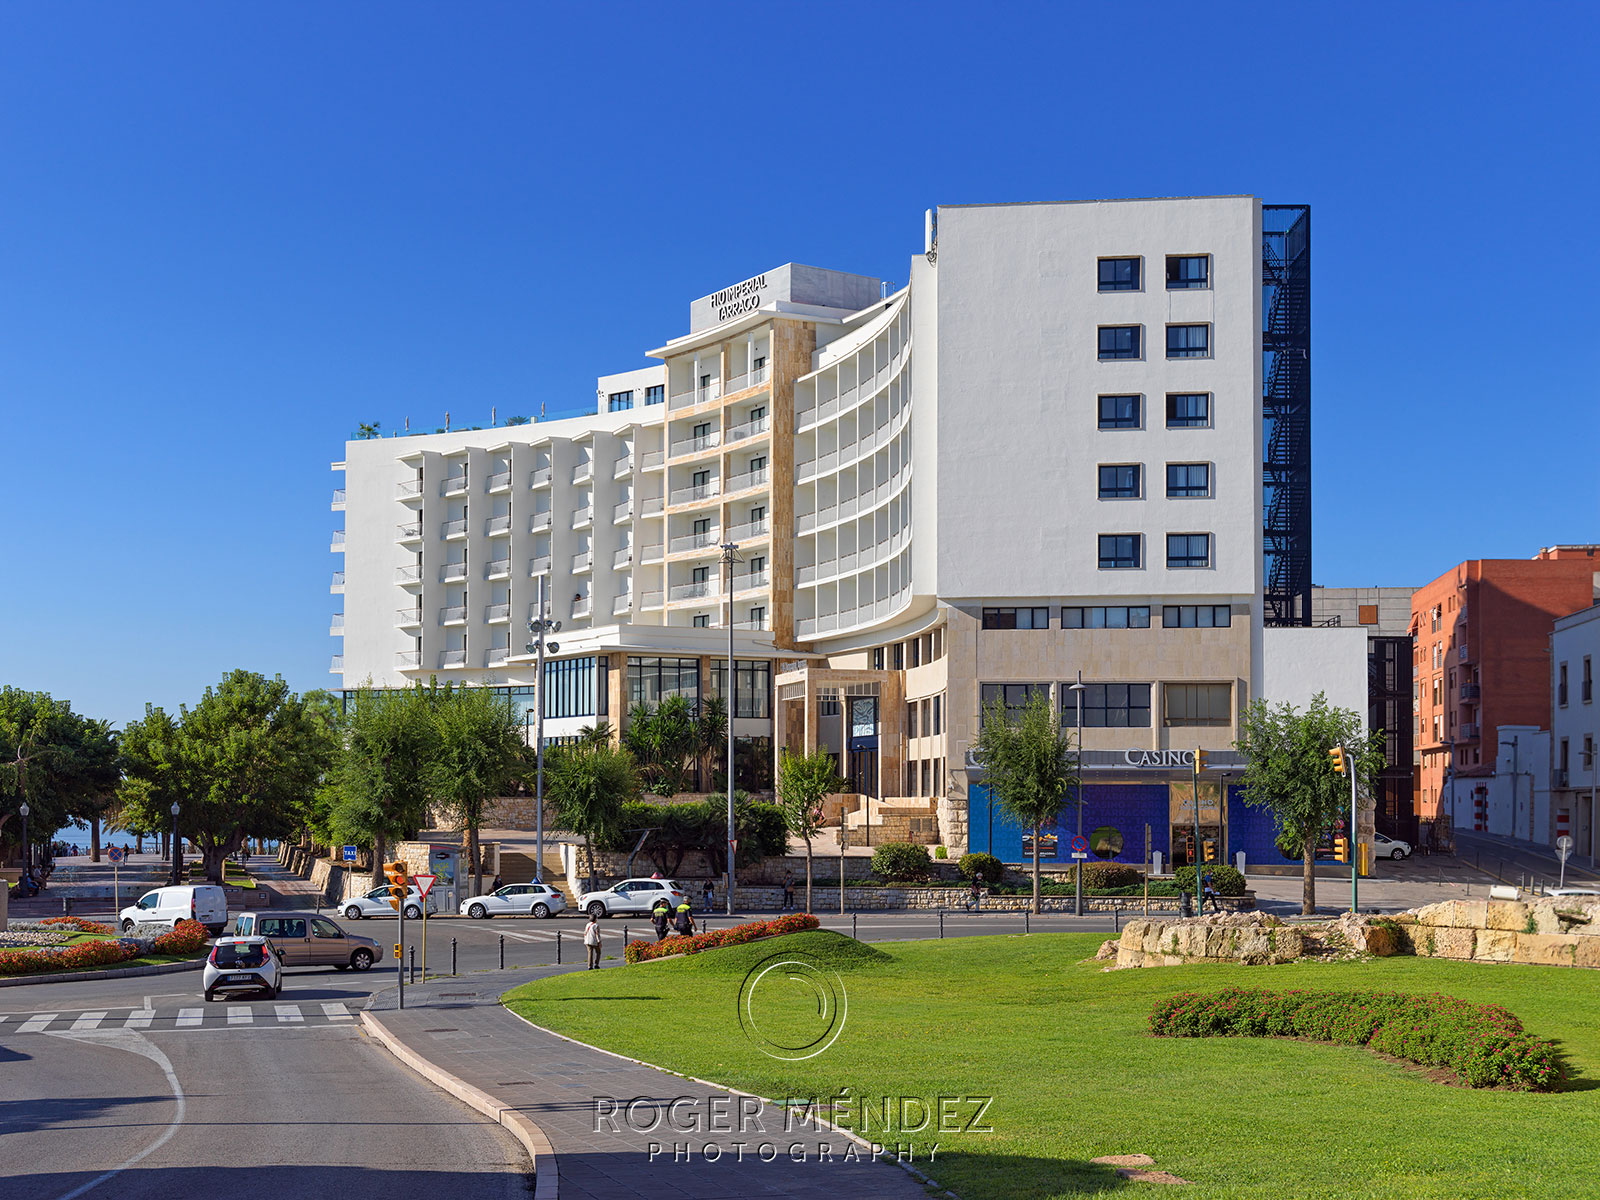 Toma de vista general del hotel